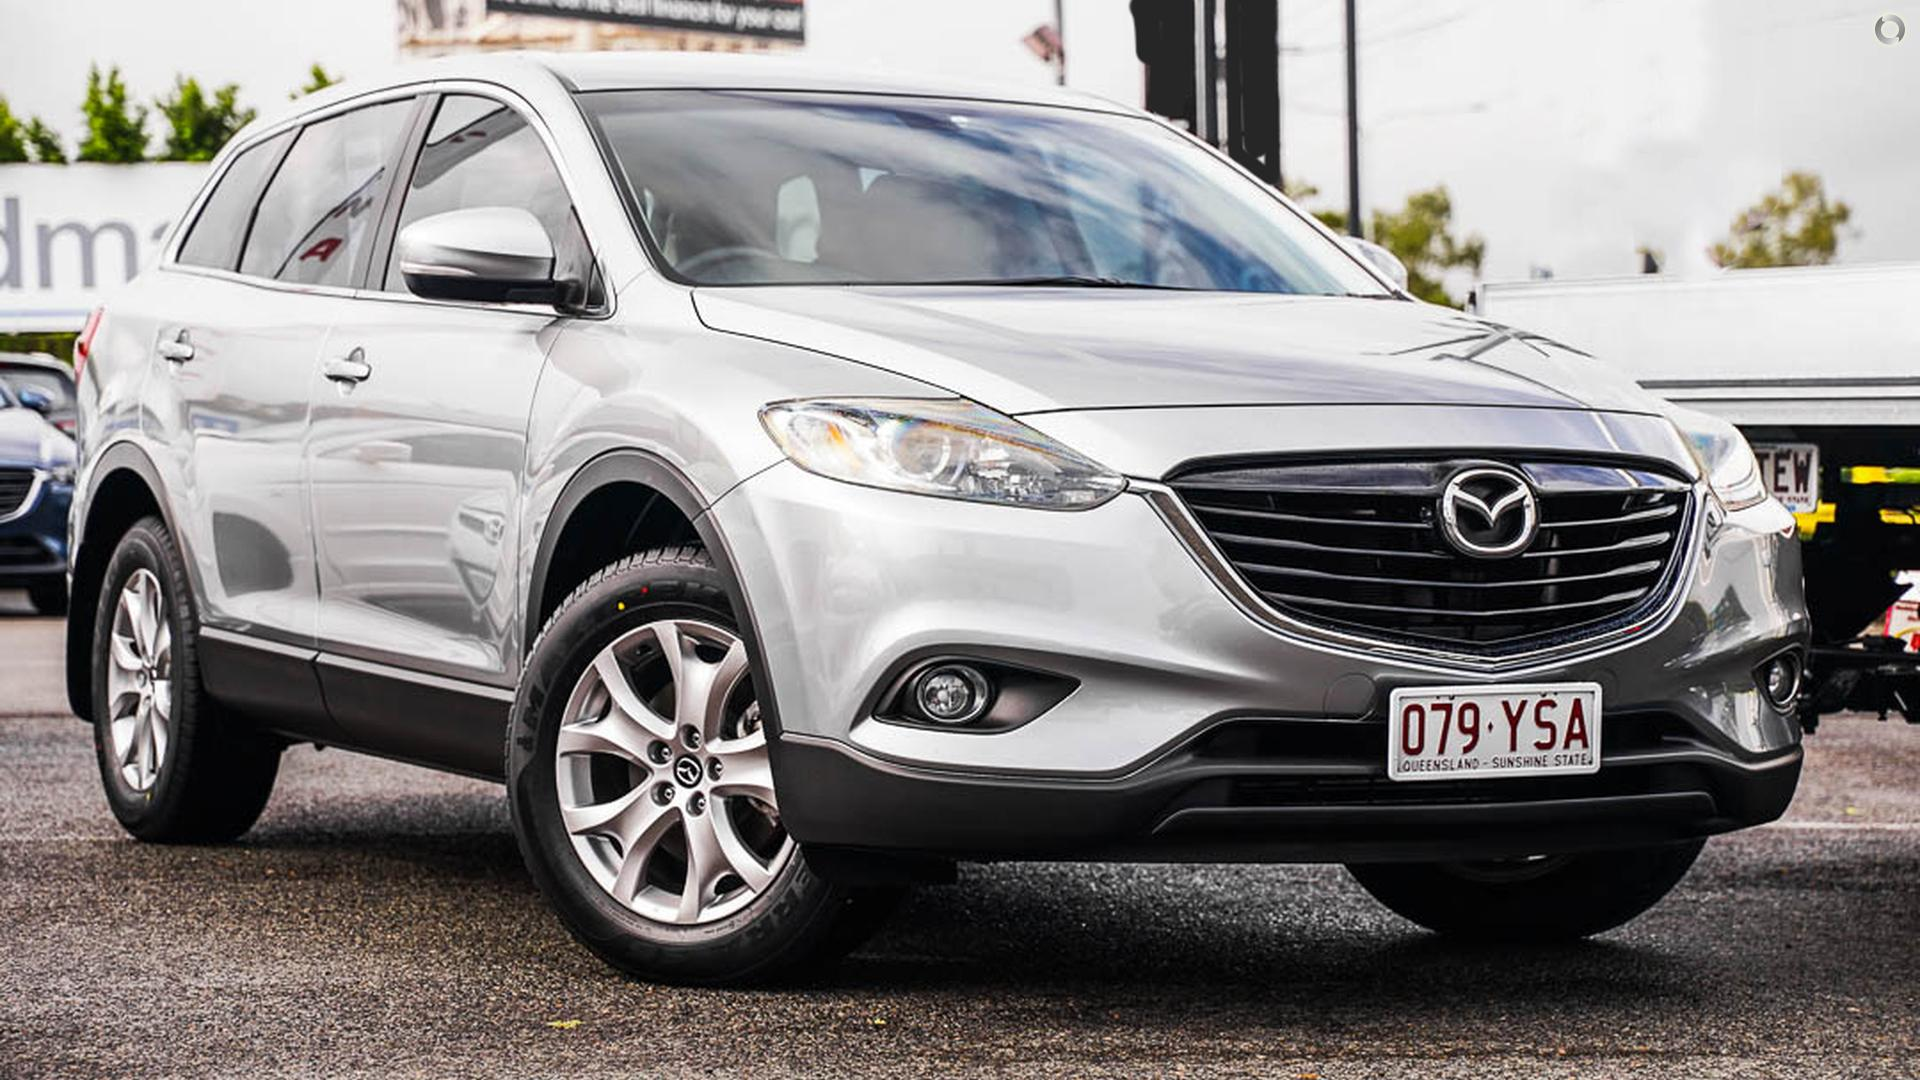 2014 Mazda Cx-9 Classic